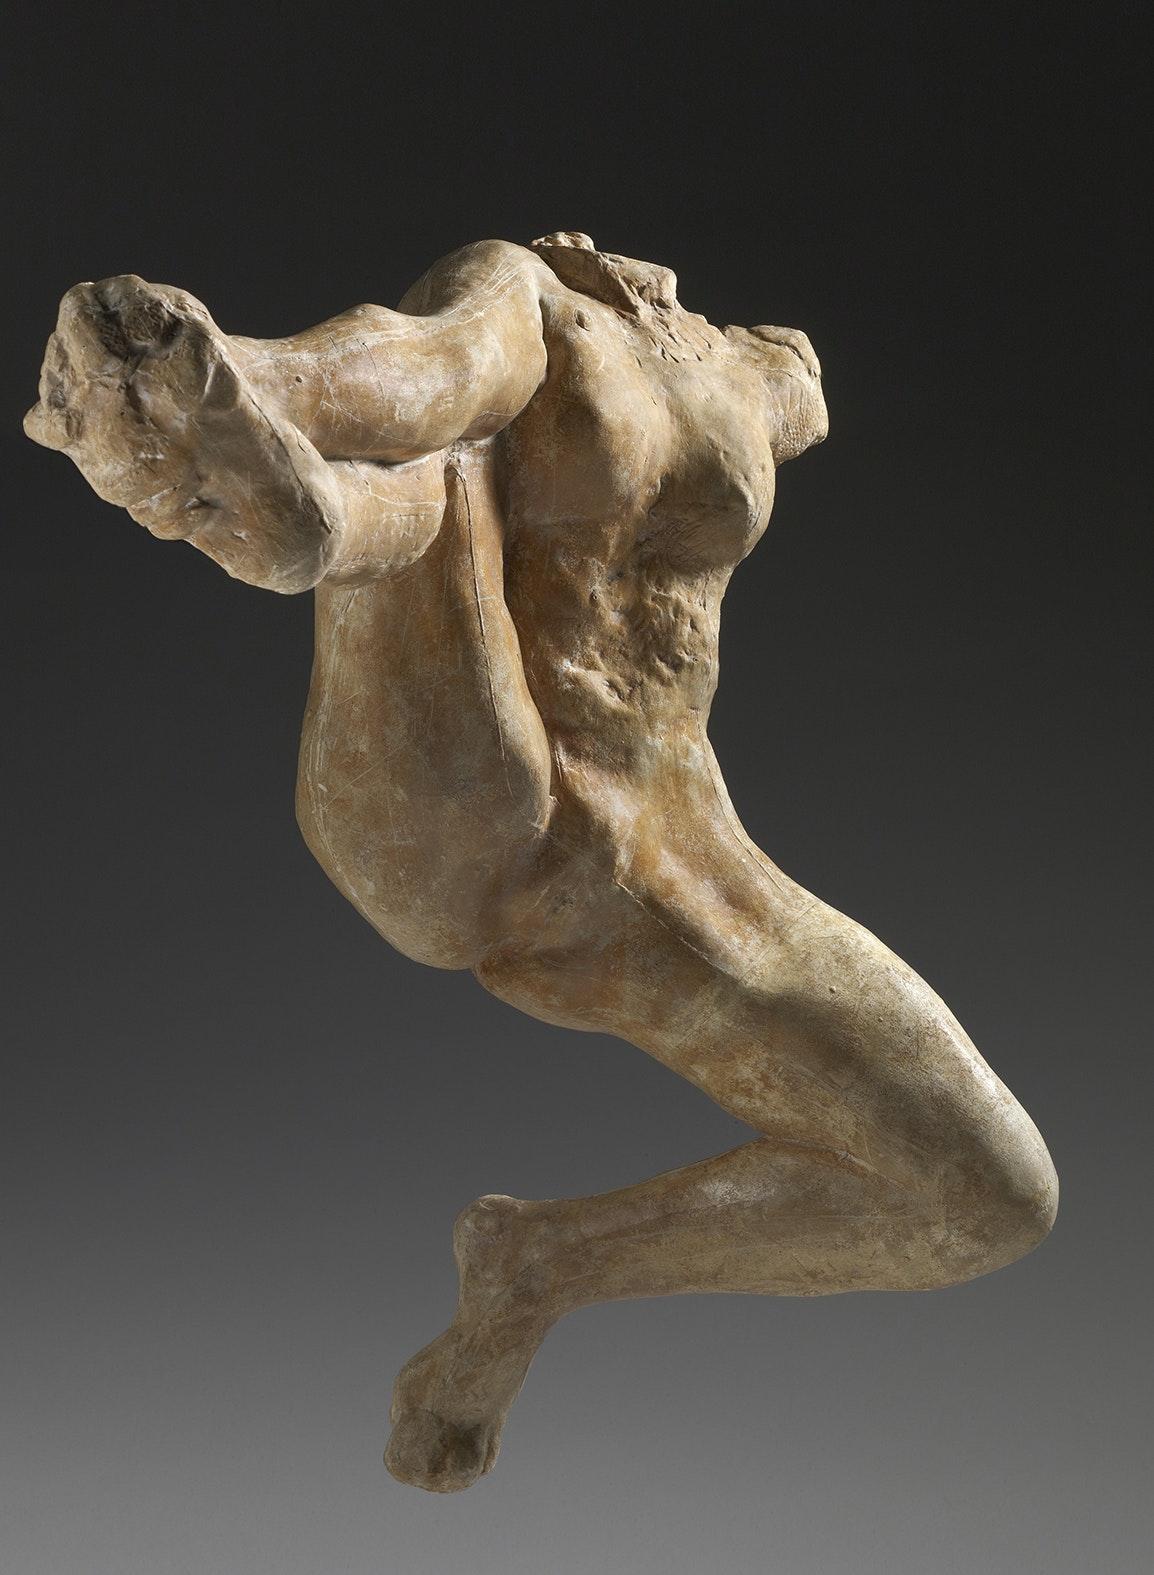 Made of plaster, this headless sculpture of Iris, messenger of the gods, extends its legs in midflight.